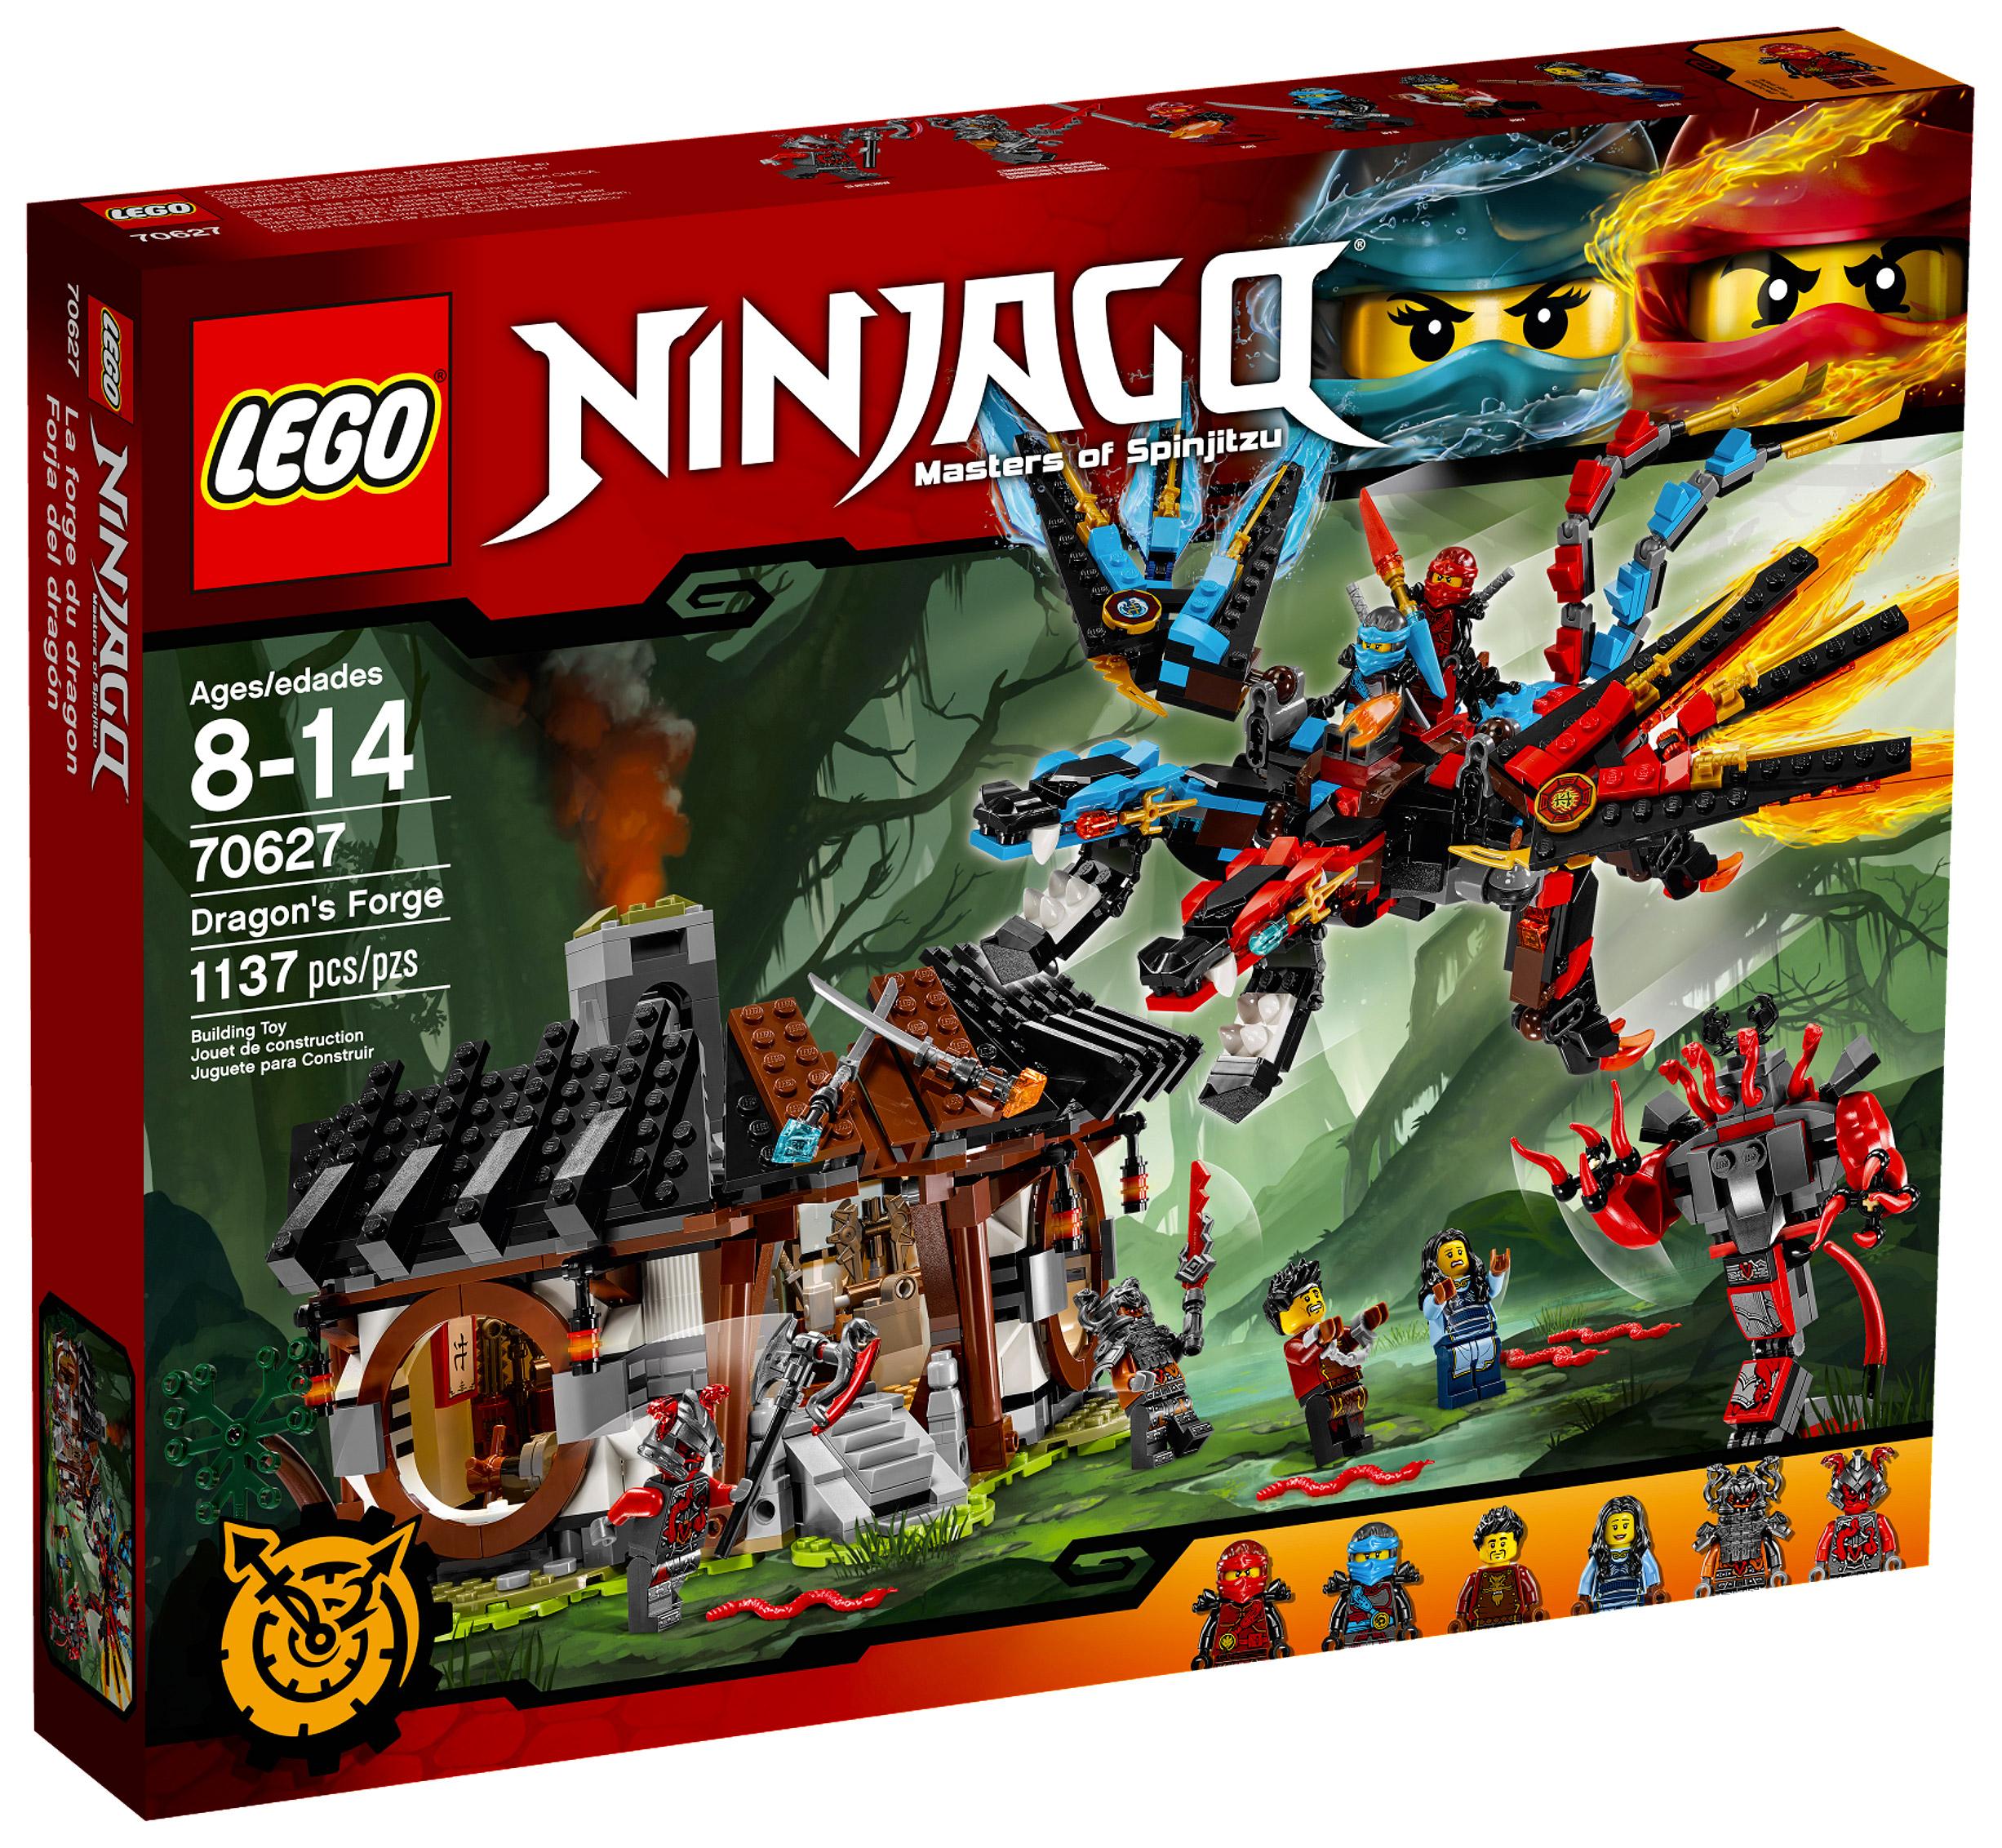 lego ninjago 70627 pas cher la forge du dragon. Black Bedroom Furniture Sets. Home Design Ideas